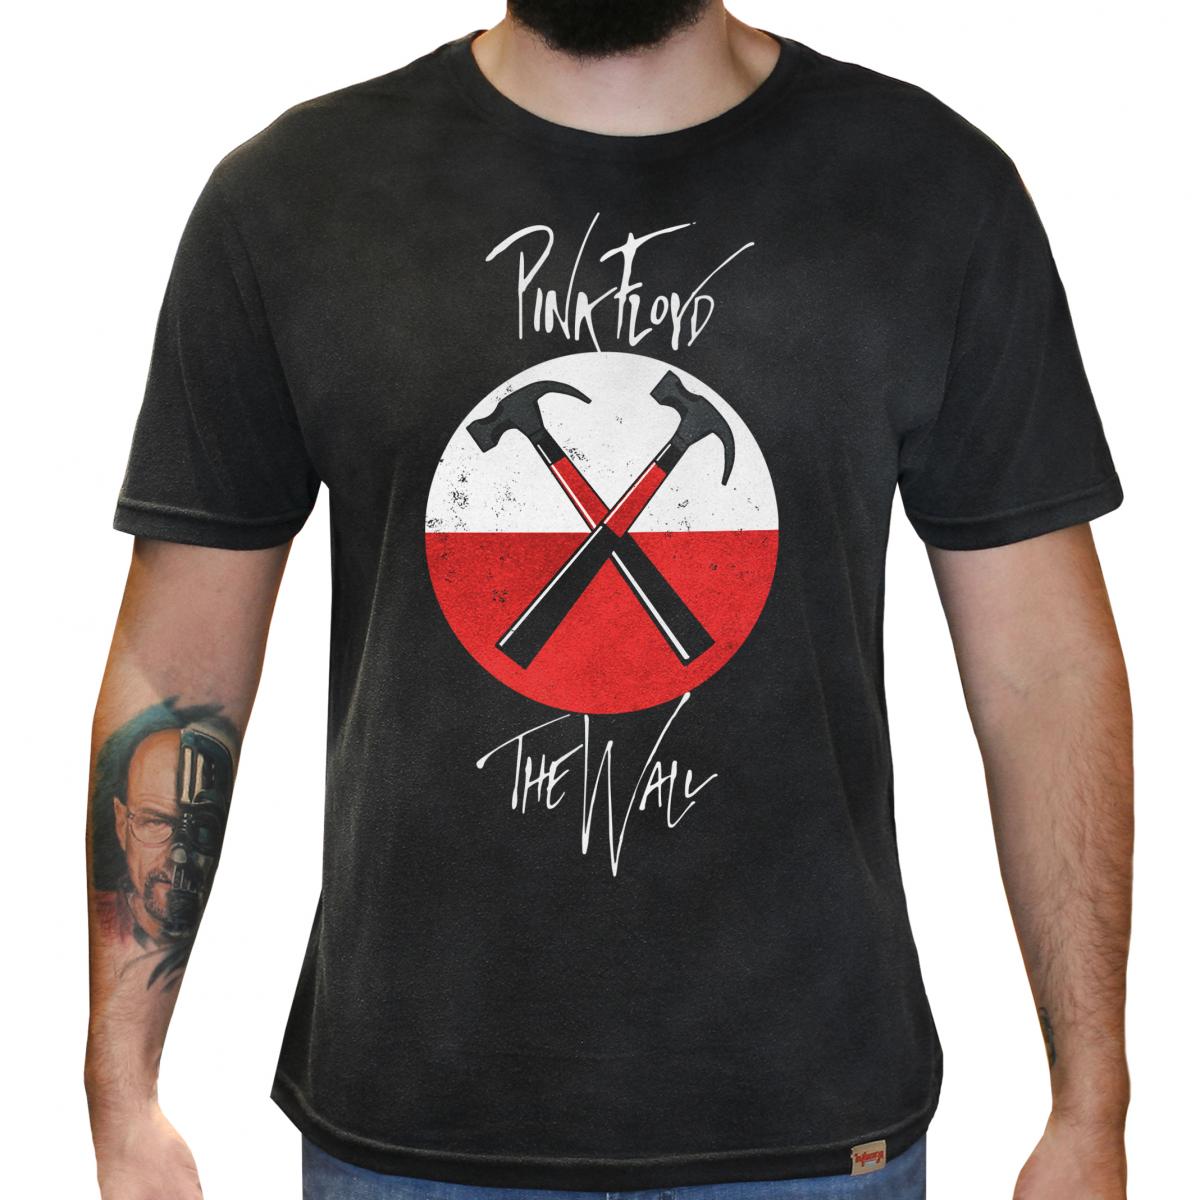 0280b1ec7 Camiseta Masculina Estonada - Pink Floyd The Wall